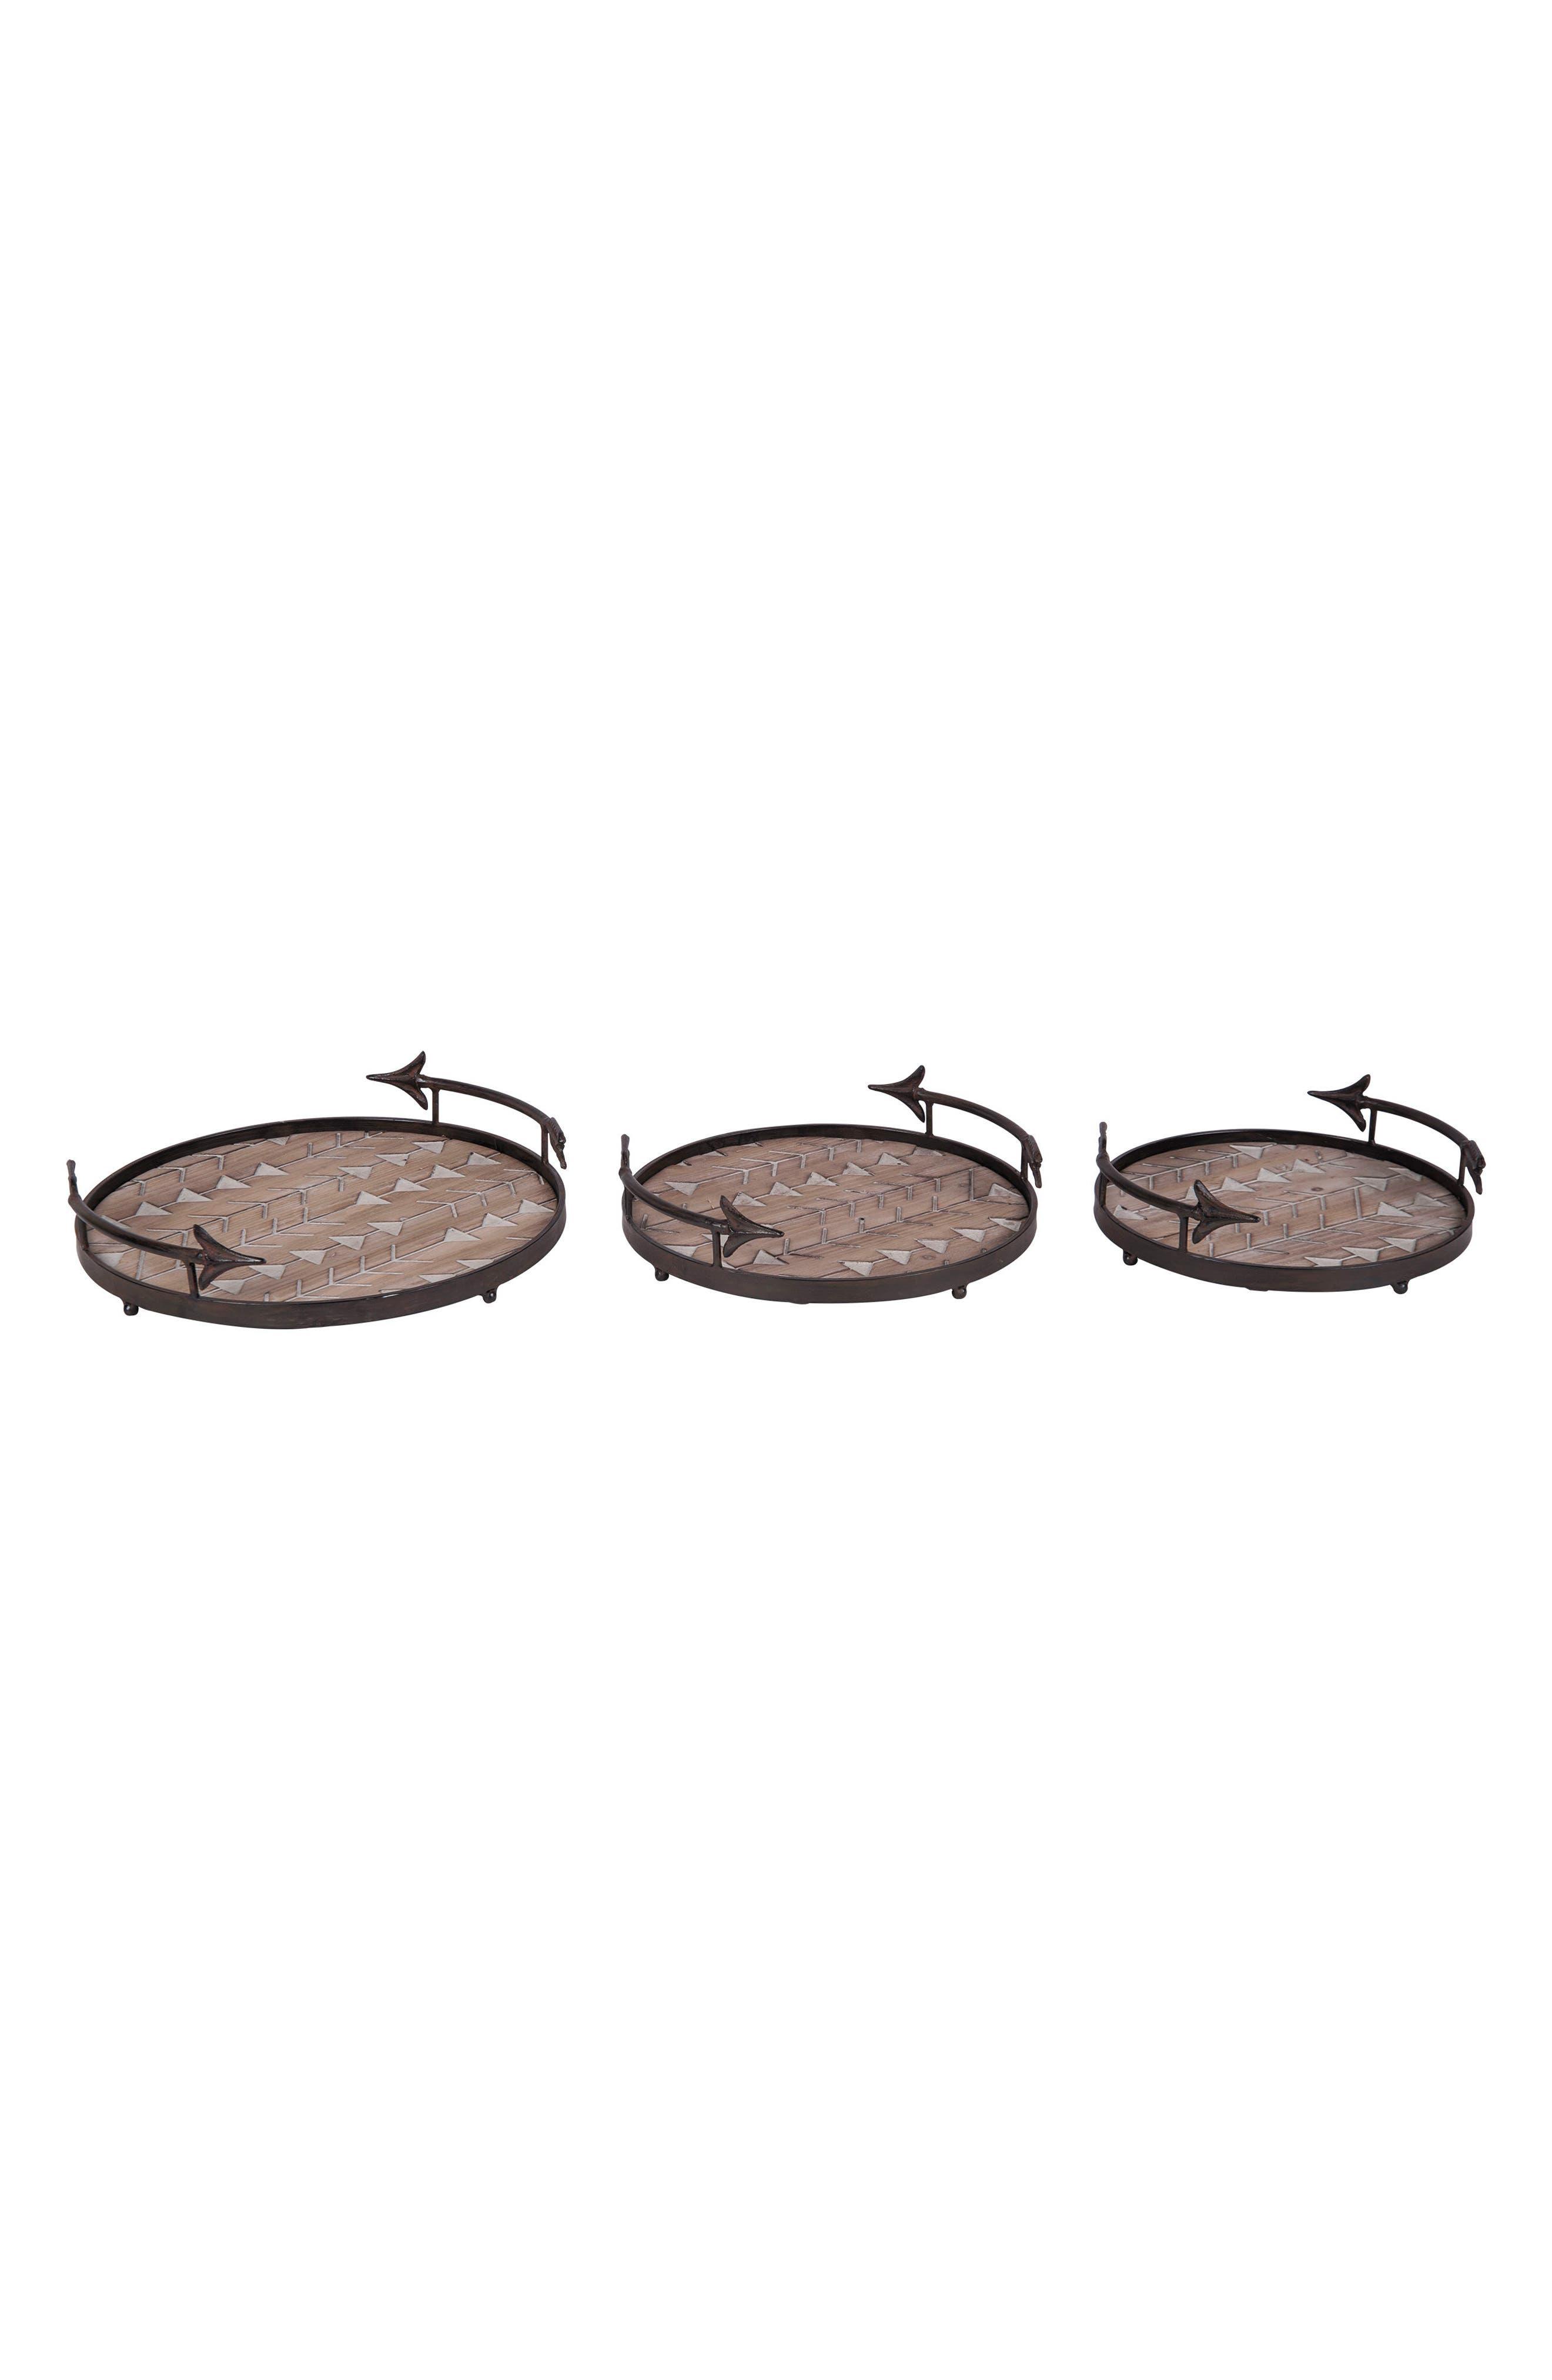 Arrow Set of 3 Nesting Trays,                         Main,                         color, Metal/ Wood